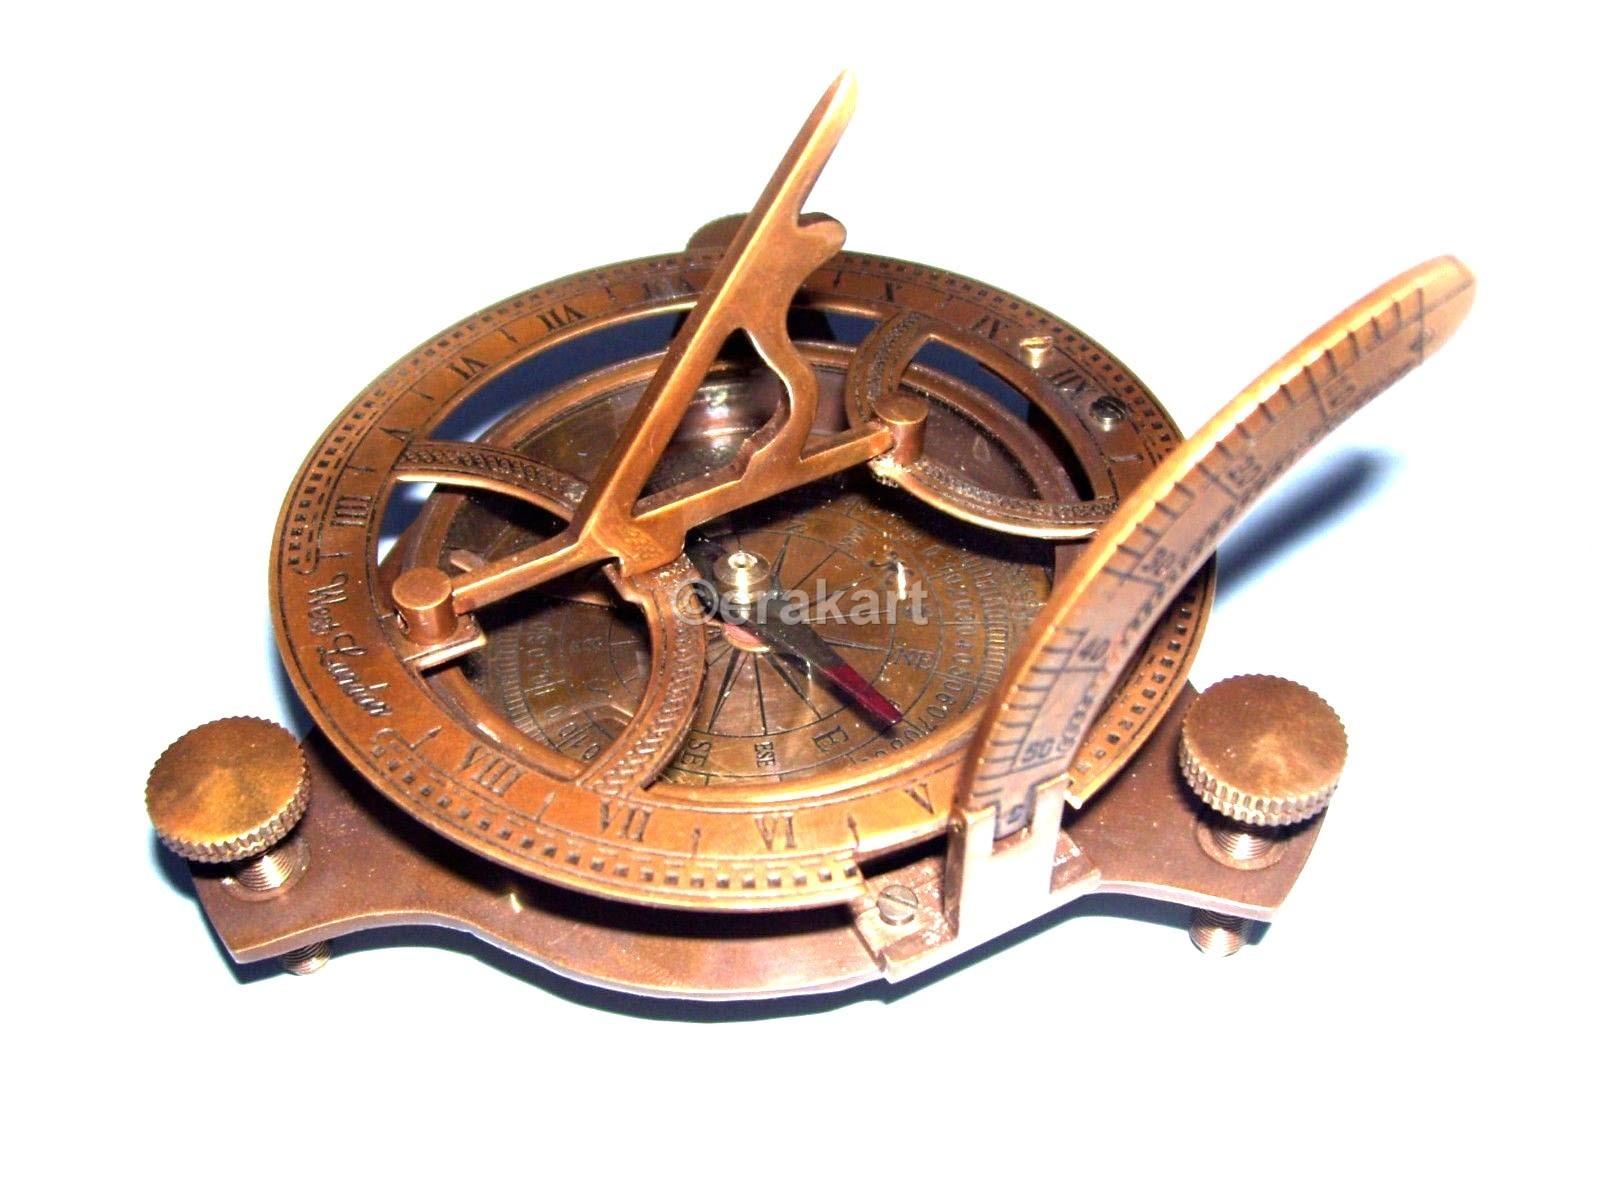 Antique Brass Sundial Compass - Buy Nautical Compasses online SALE.